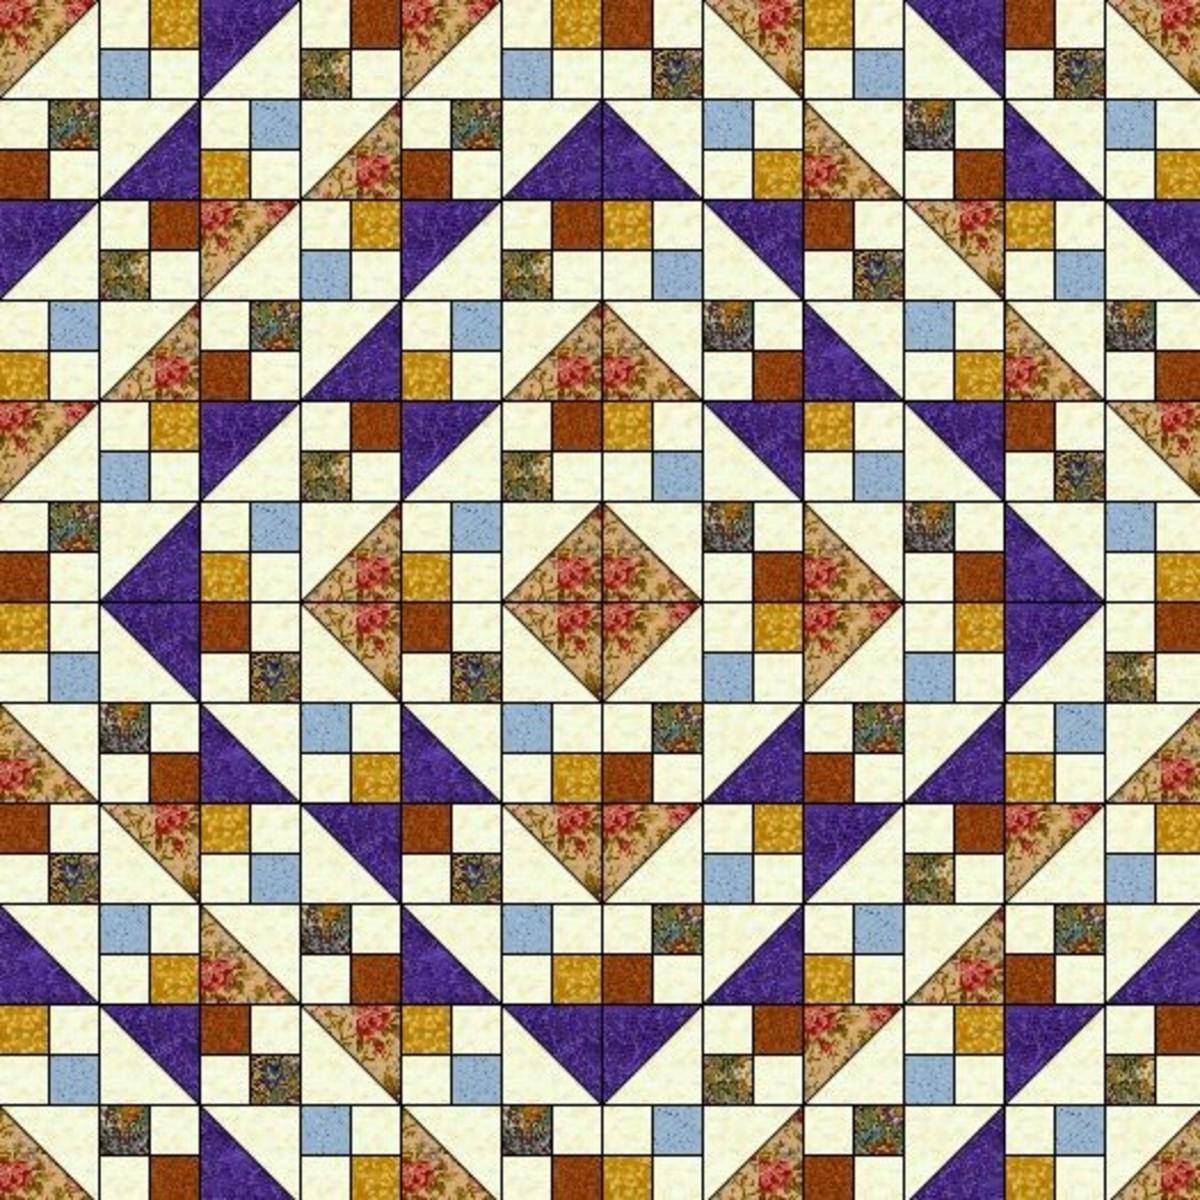 Jewel Box medallion set quilt layout